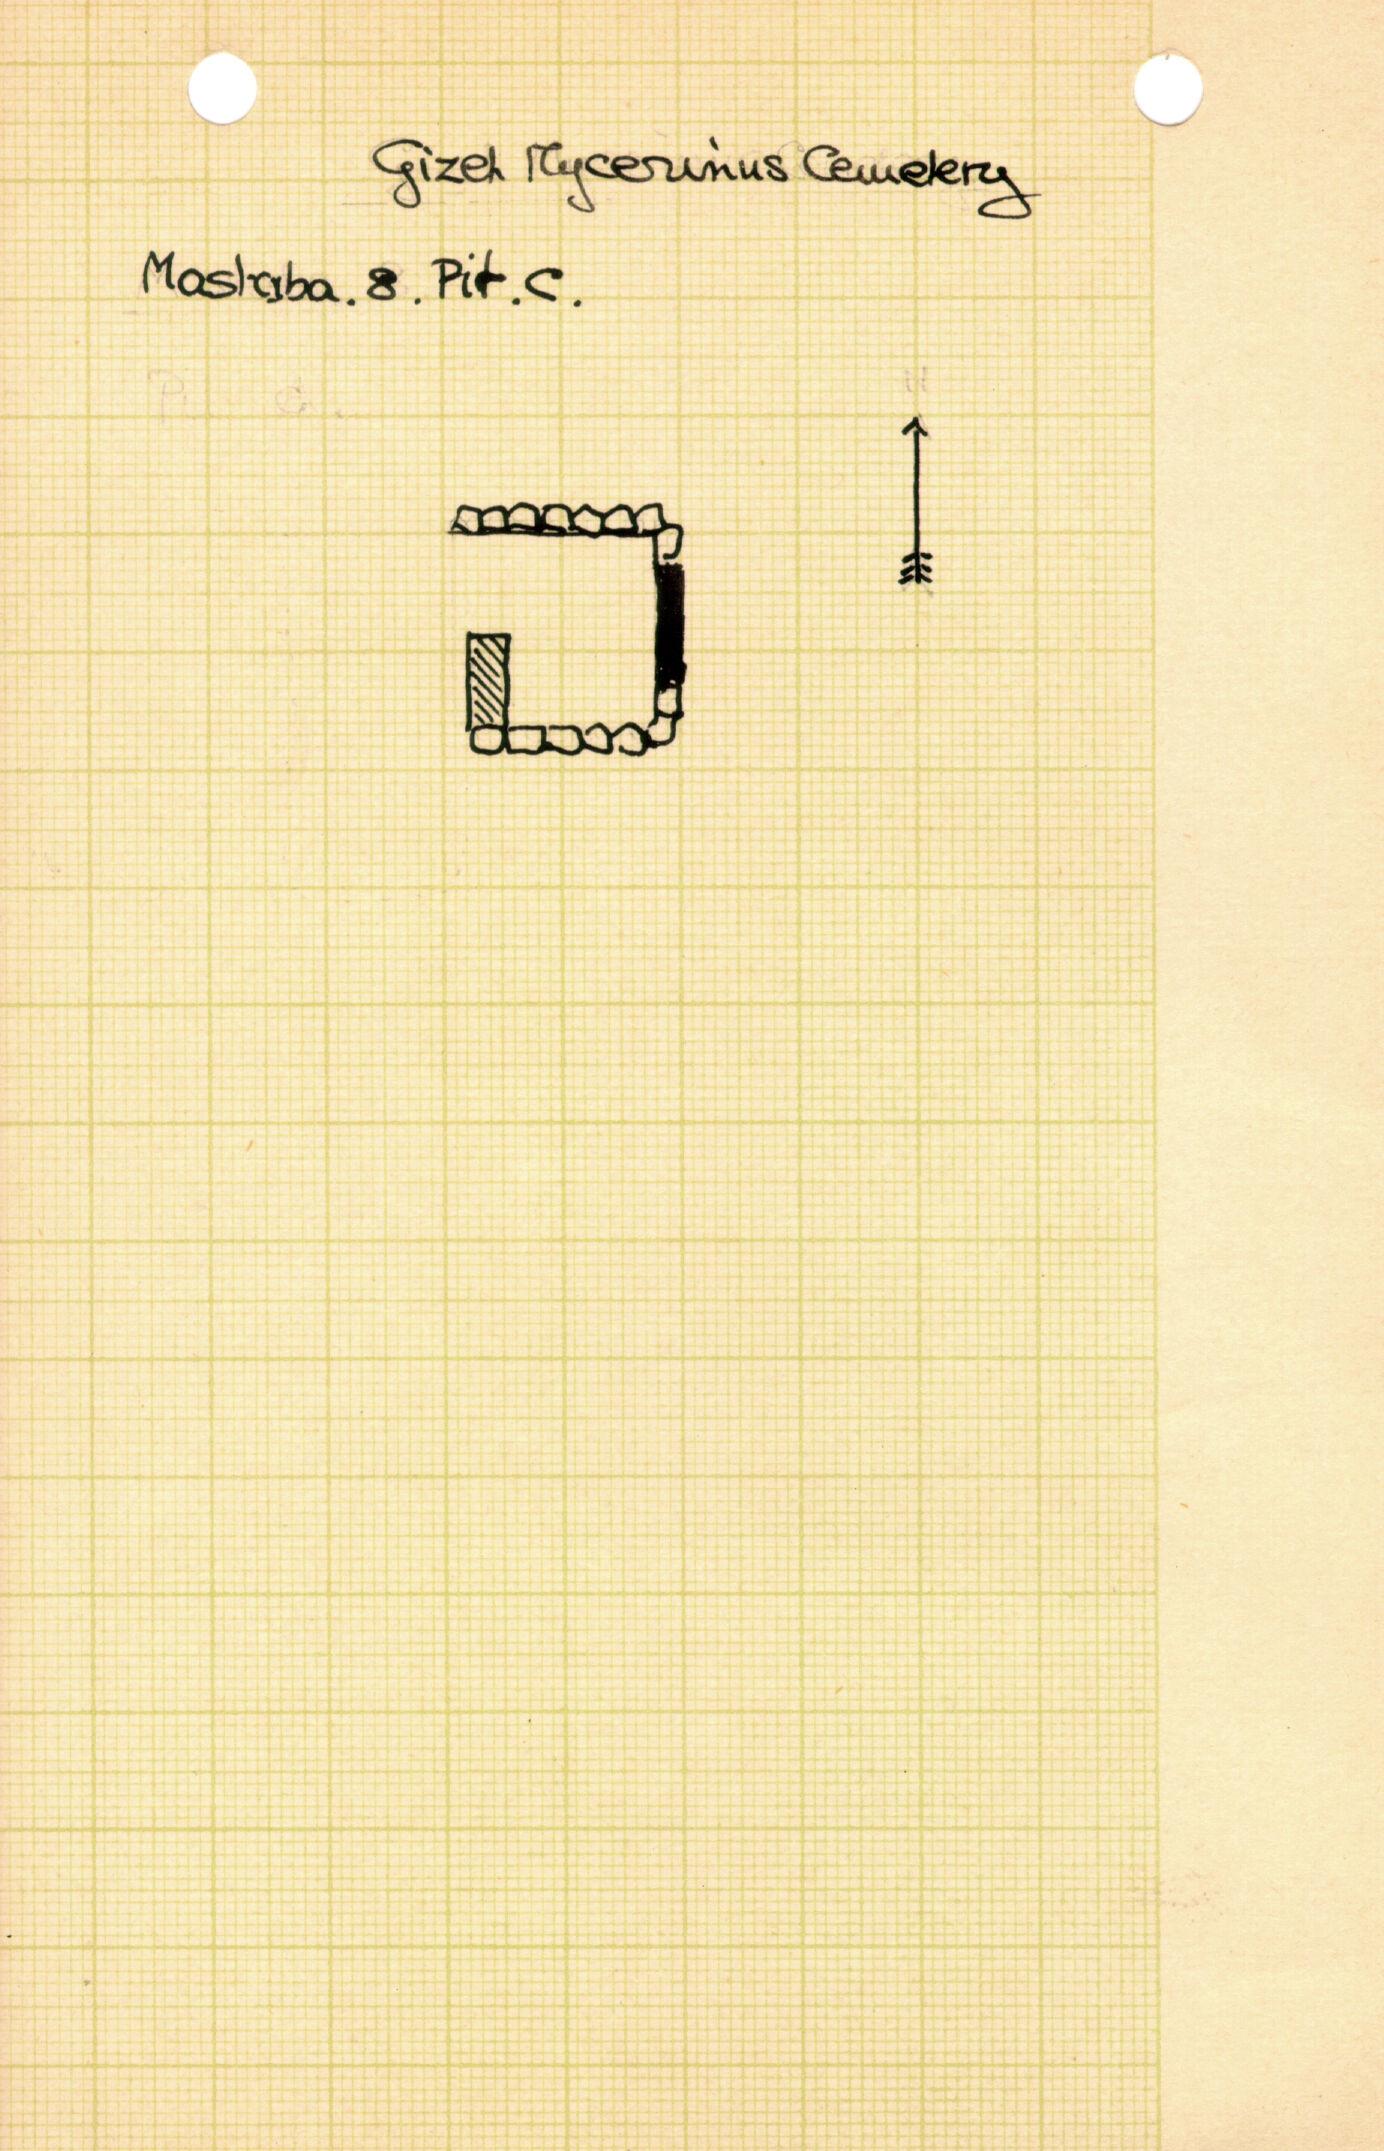 Maps and plans: MQ 8, Shaft C